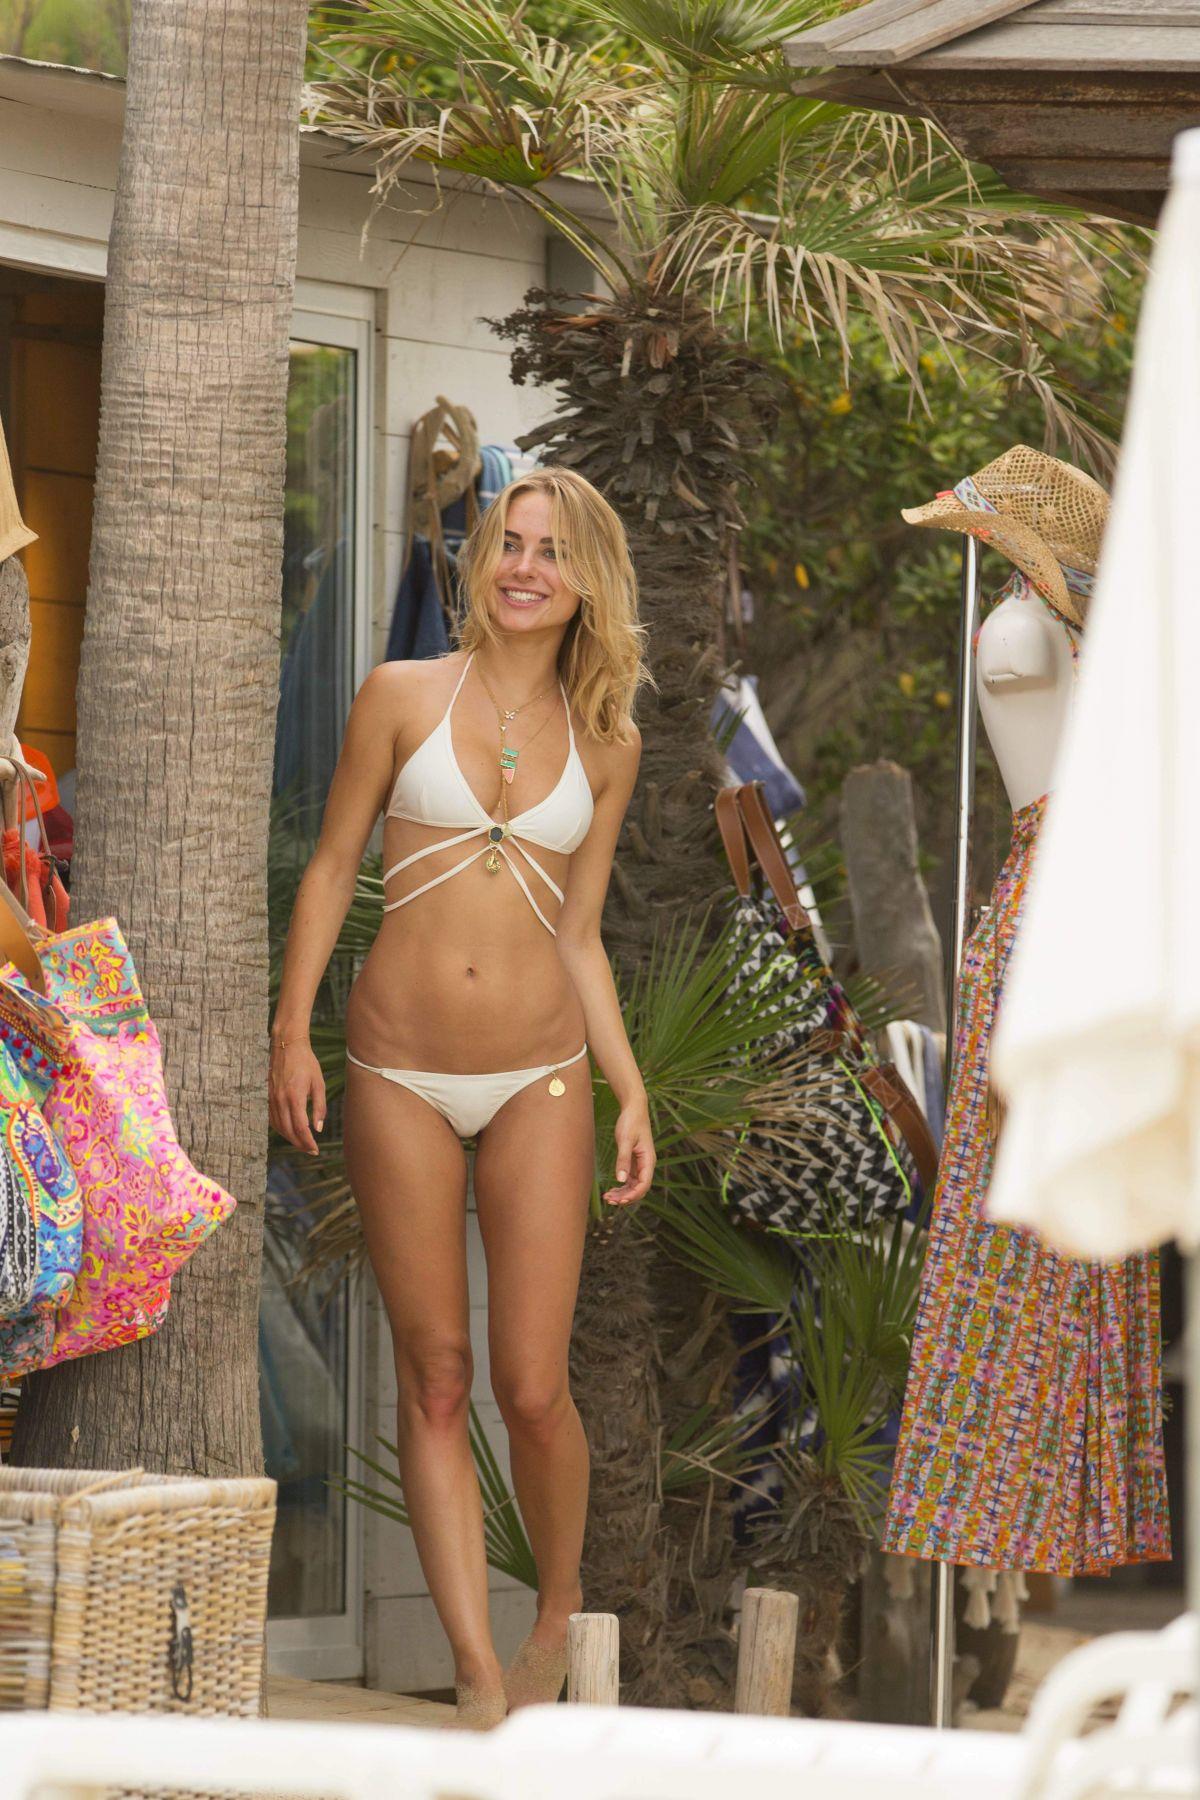 f541d85c5dca7 kimberley-garner-in-bikini-on-a-beach-in-st.-tropez-08-04-2016 23 ...